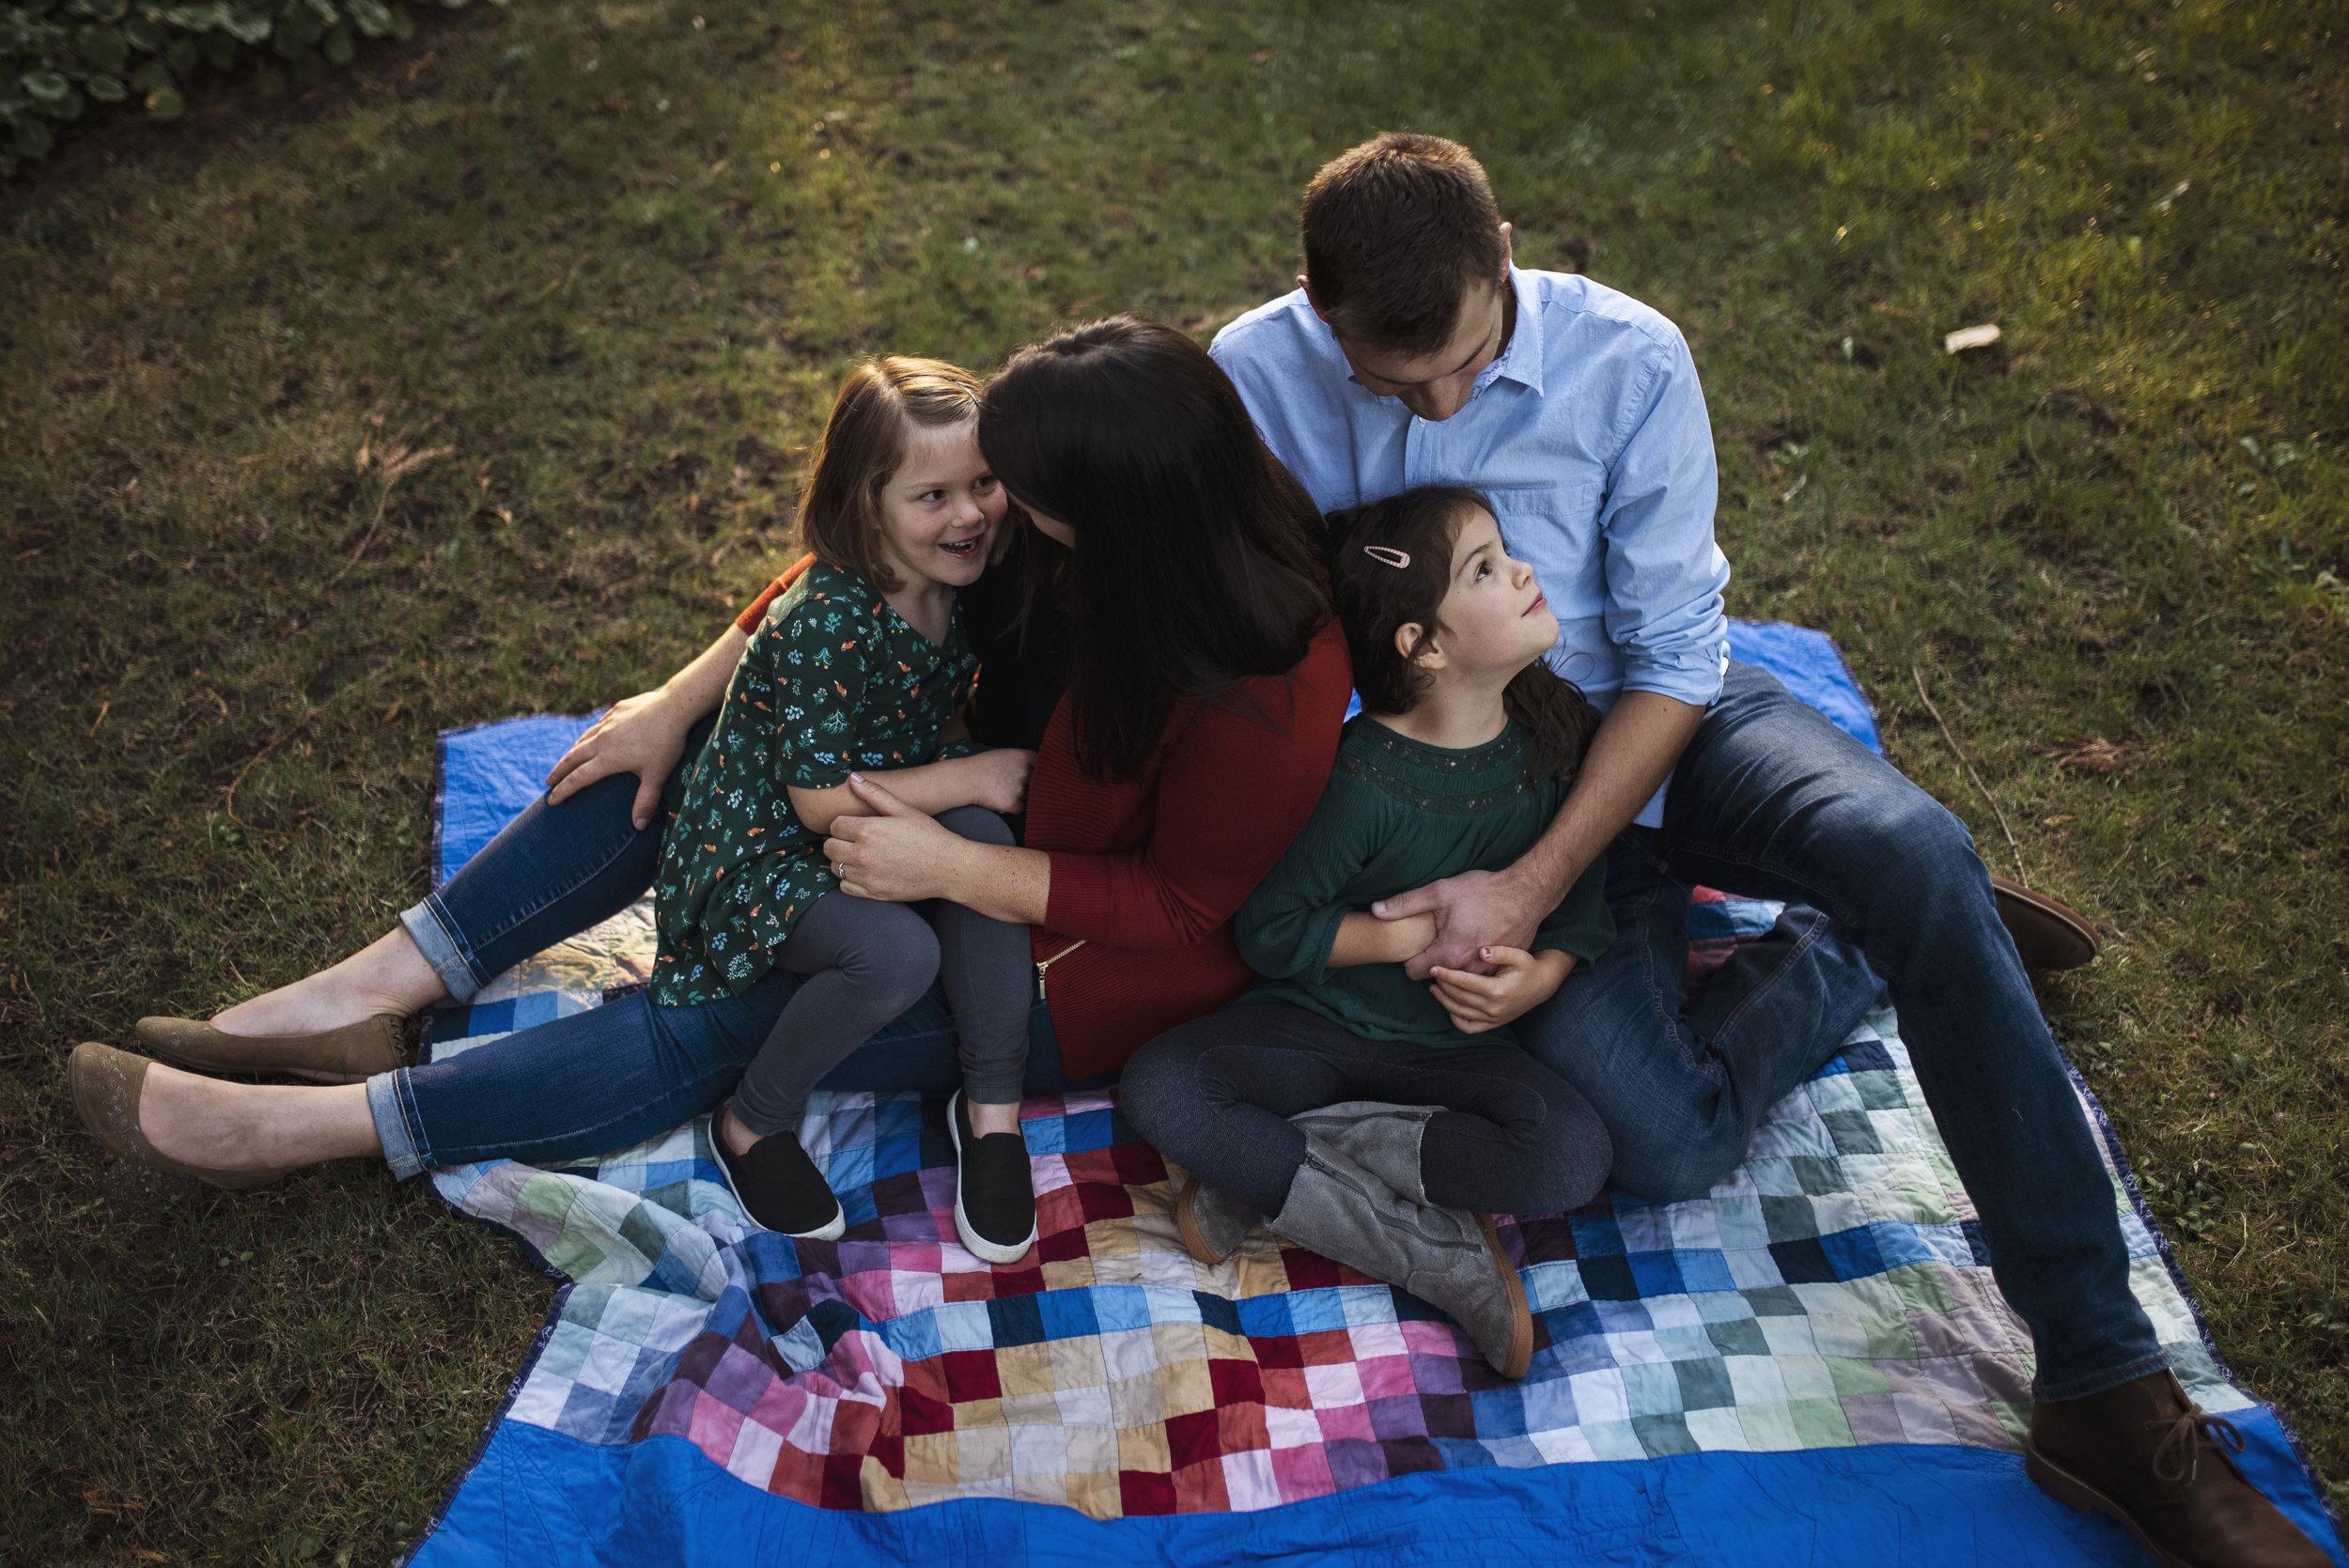 Edmonds family photographer family together on blanket